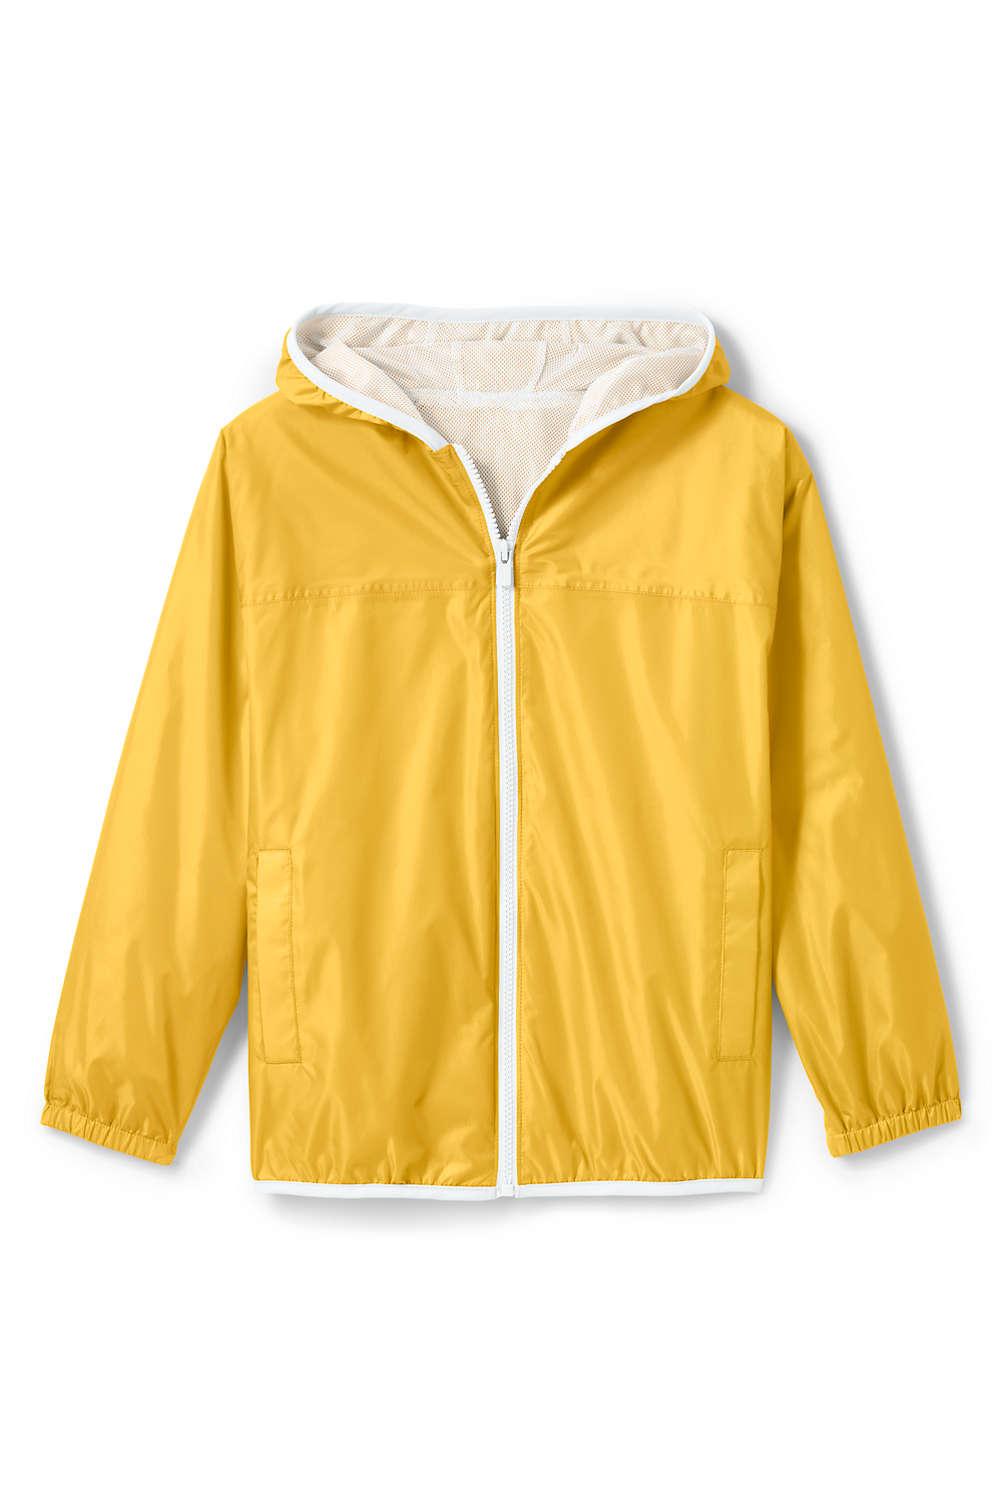 Toddler Kids Waterproof Rain Jacket